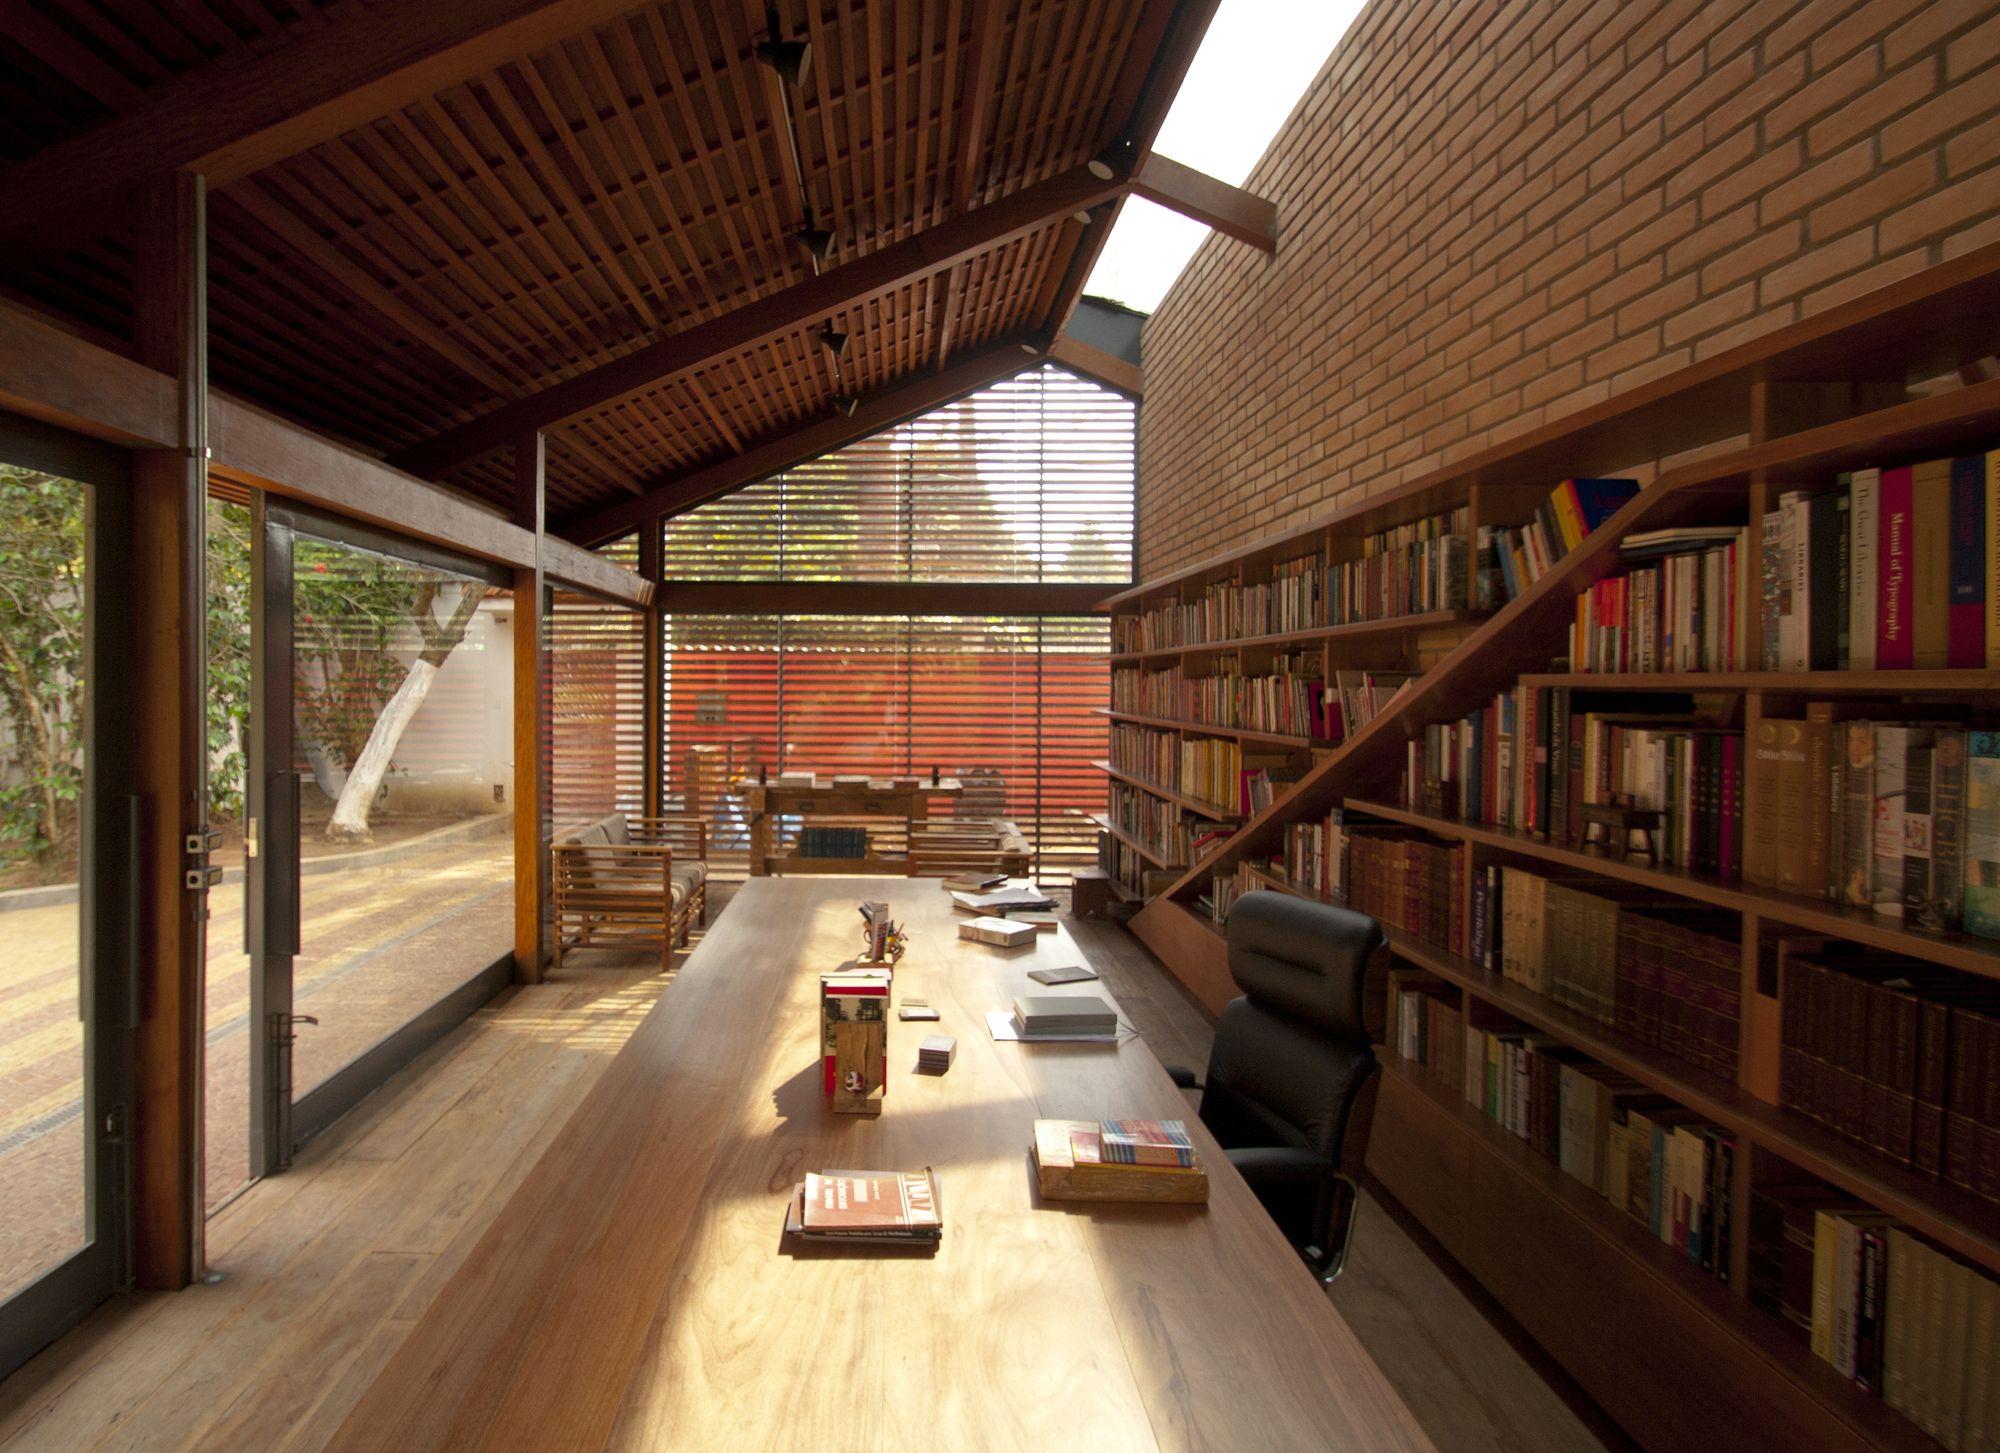 Gallery of Cotia Library Garden / IPEA - 1   Интерьер общественный ...